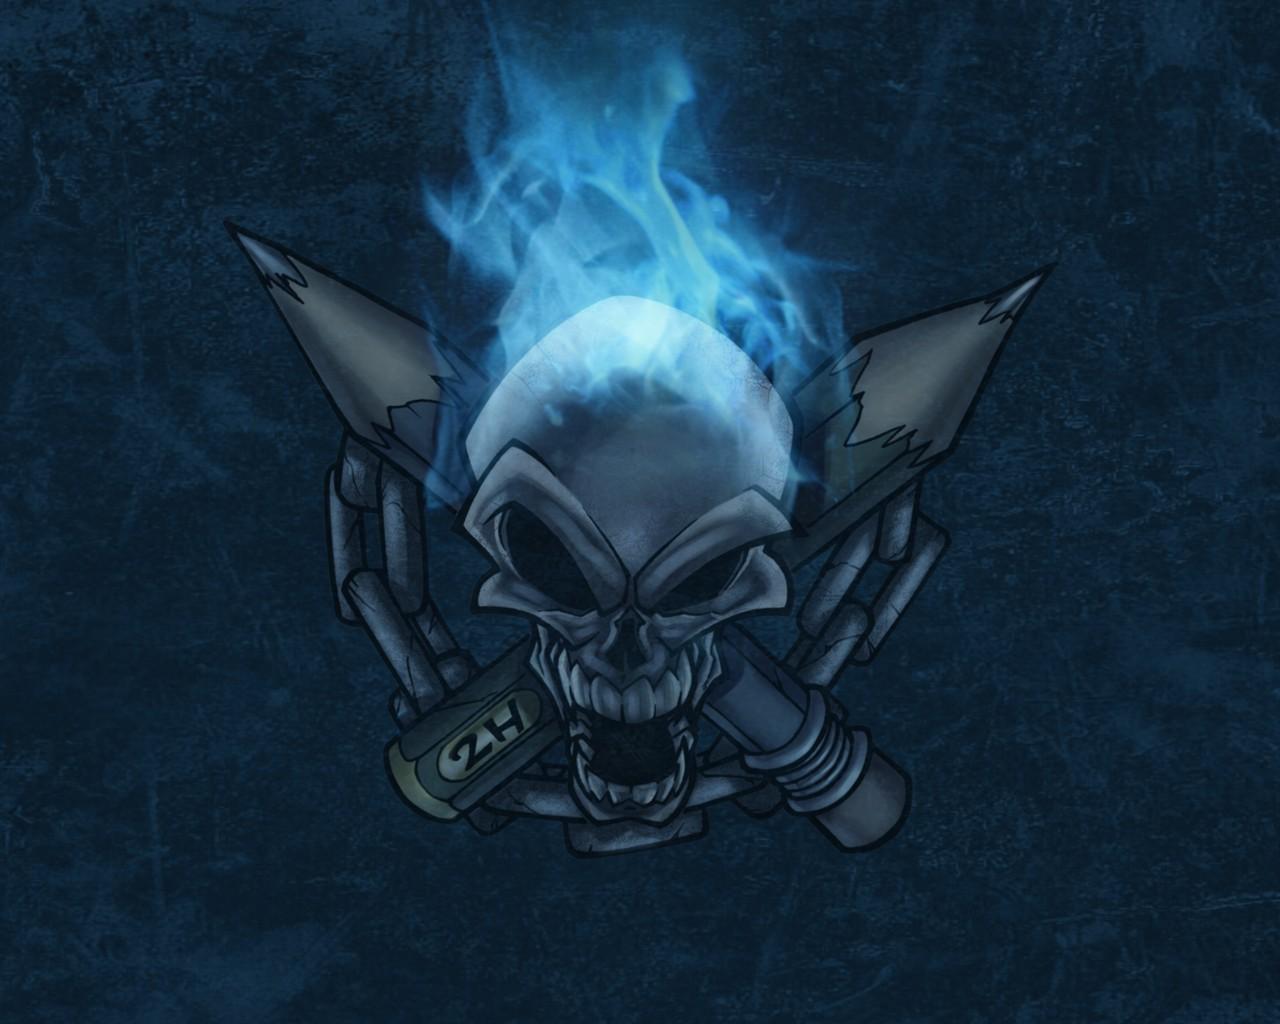 http://2.bp.blogspot.com/-P3RYh36UDzA/UGM5DE2mpqI/AAAAAAAAArQ/PWCRU2SARVQ/s1600/blue-flames-skull.jpg